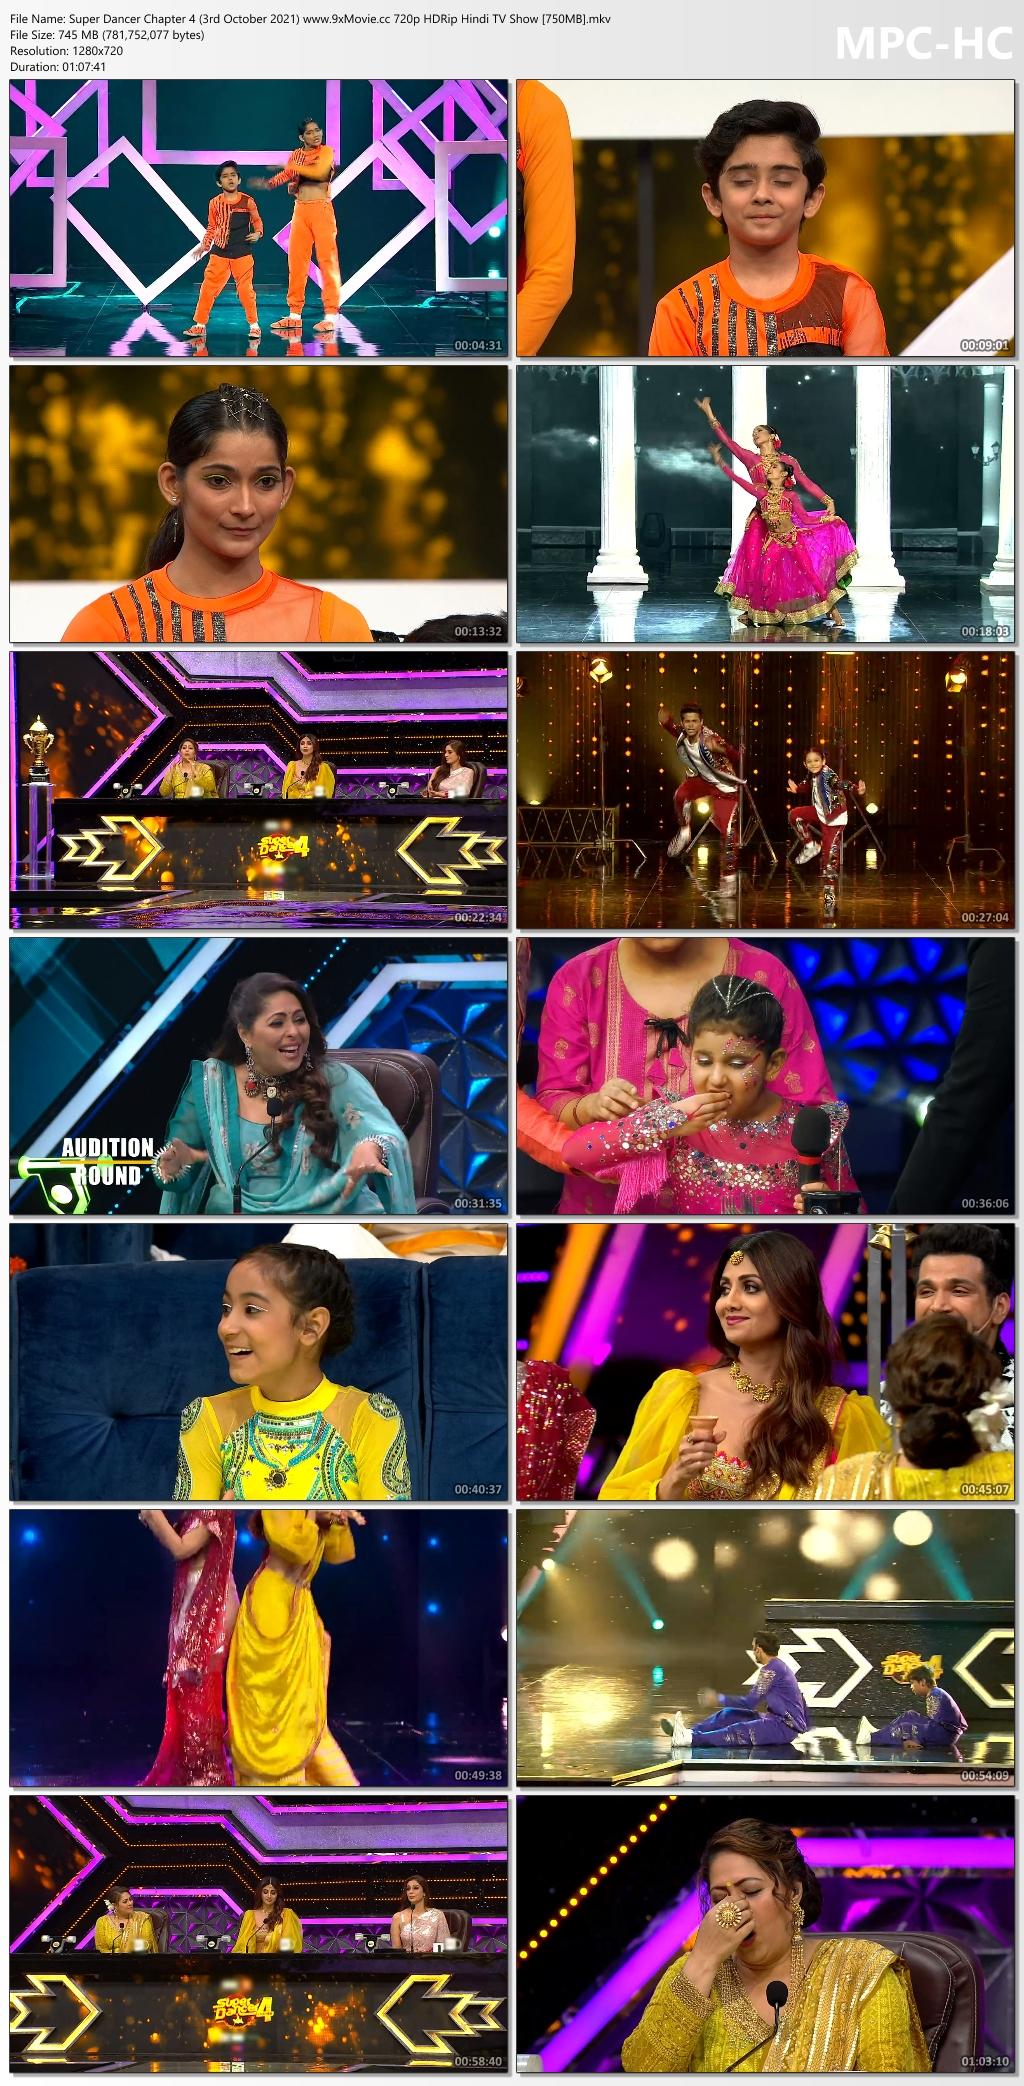 Super-Dancer-Chapter-4-3rd-October-2021-www-9x-Movie-cc-720p-HDRip-Hindi-TV-Show-750-MB-mkv